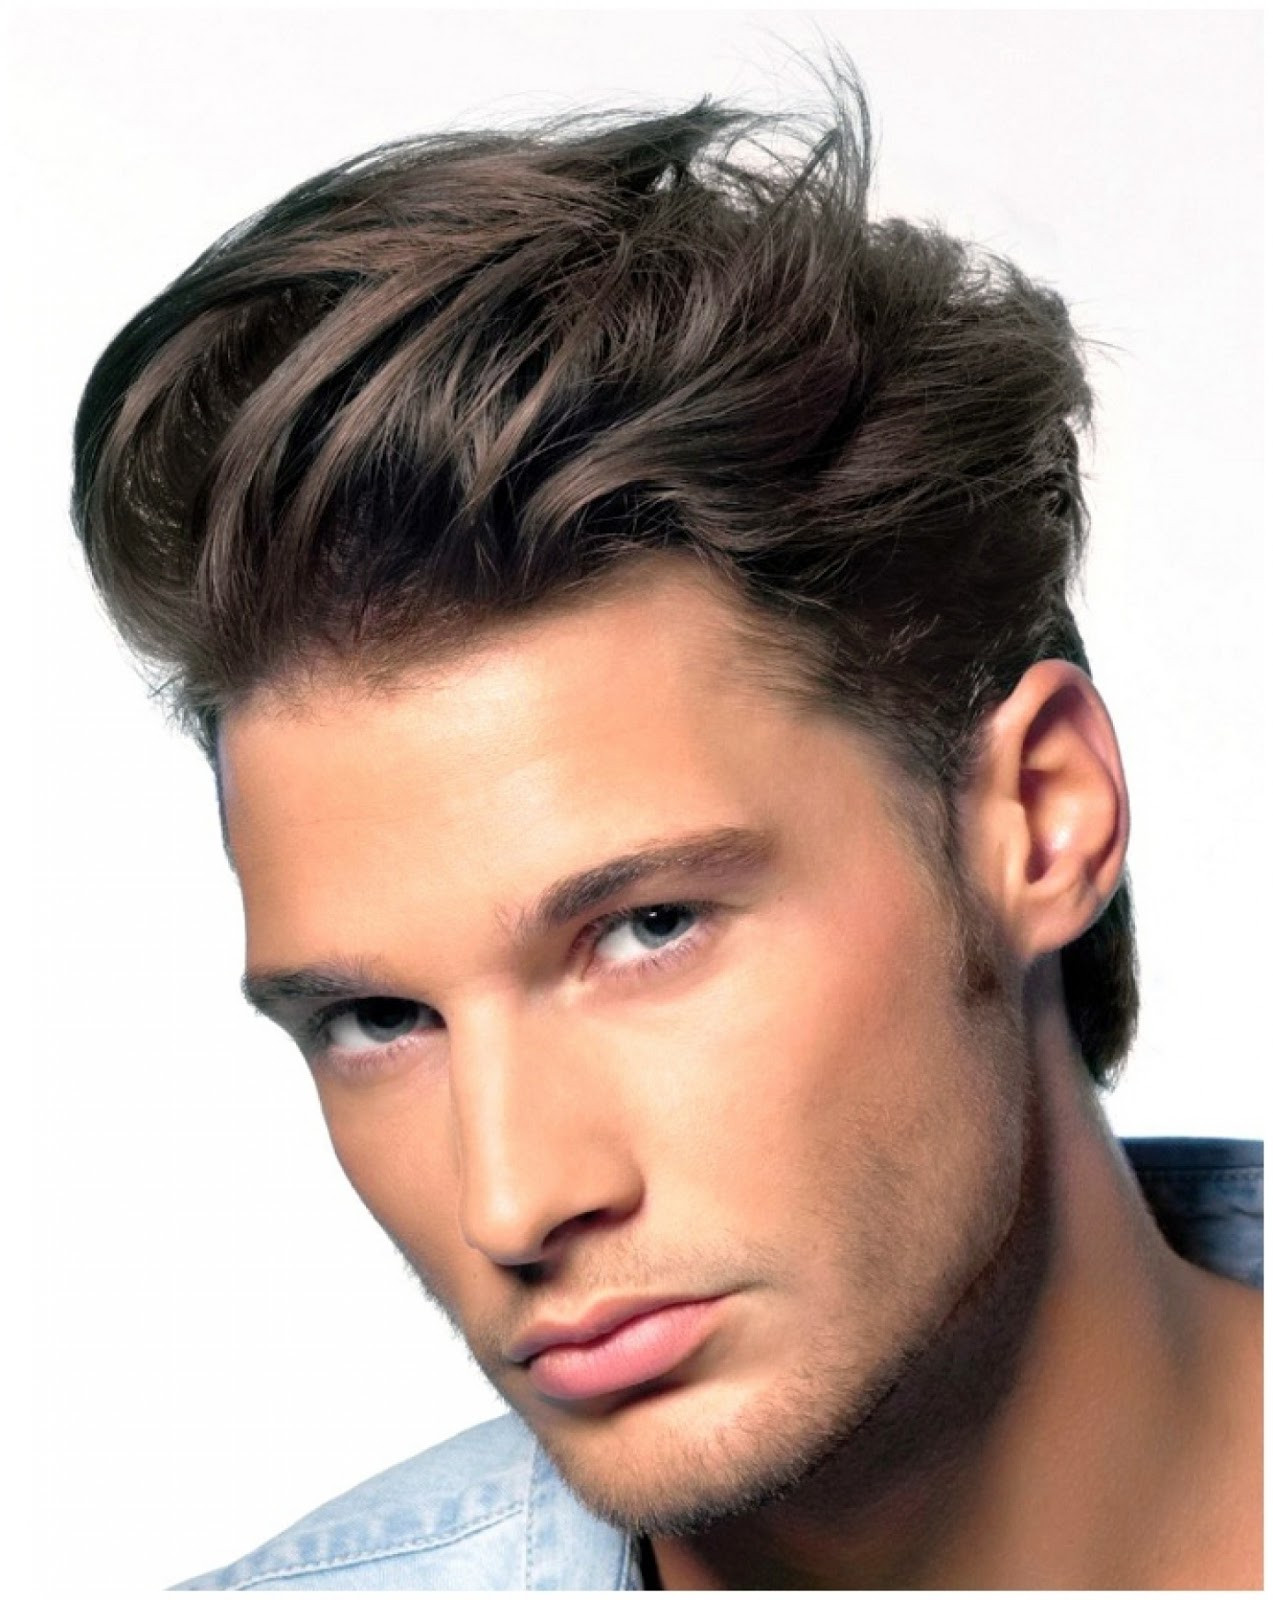 Undercut Haircuts Men  The Undercut e The Best Hairstyle For Men